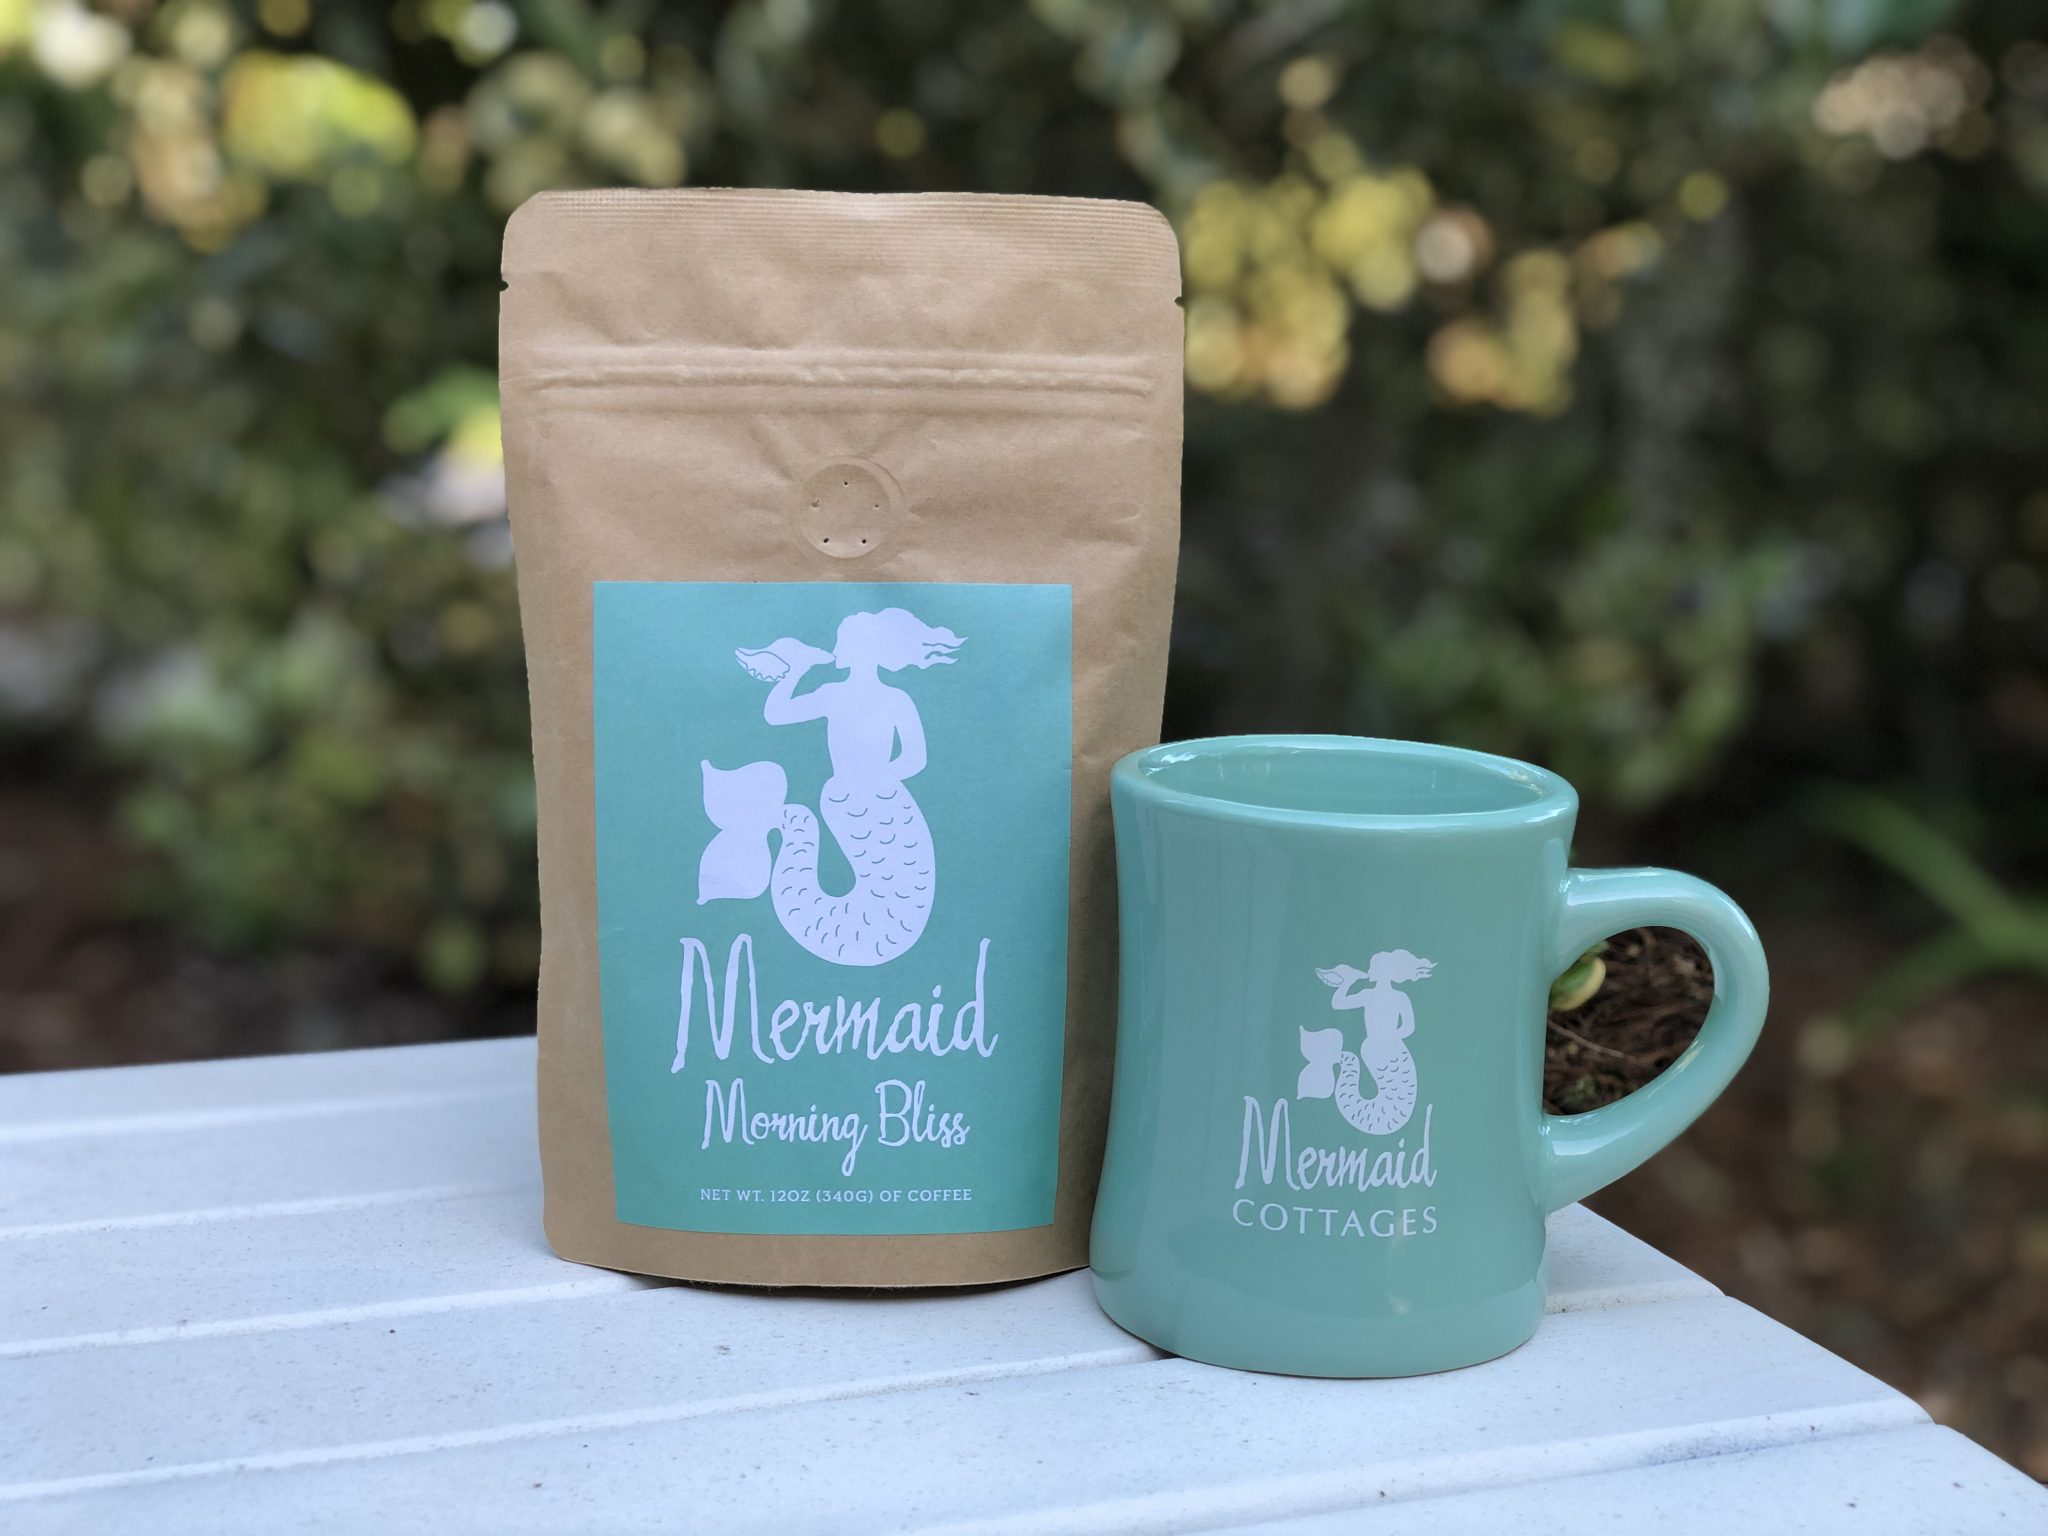 mermaid morning bliss coffee